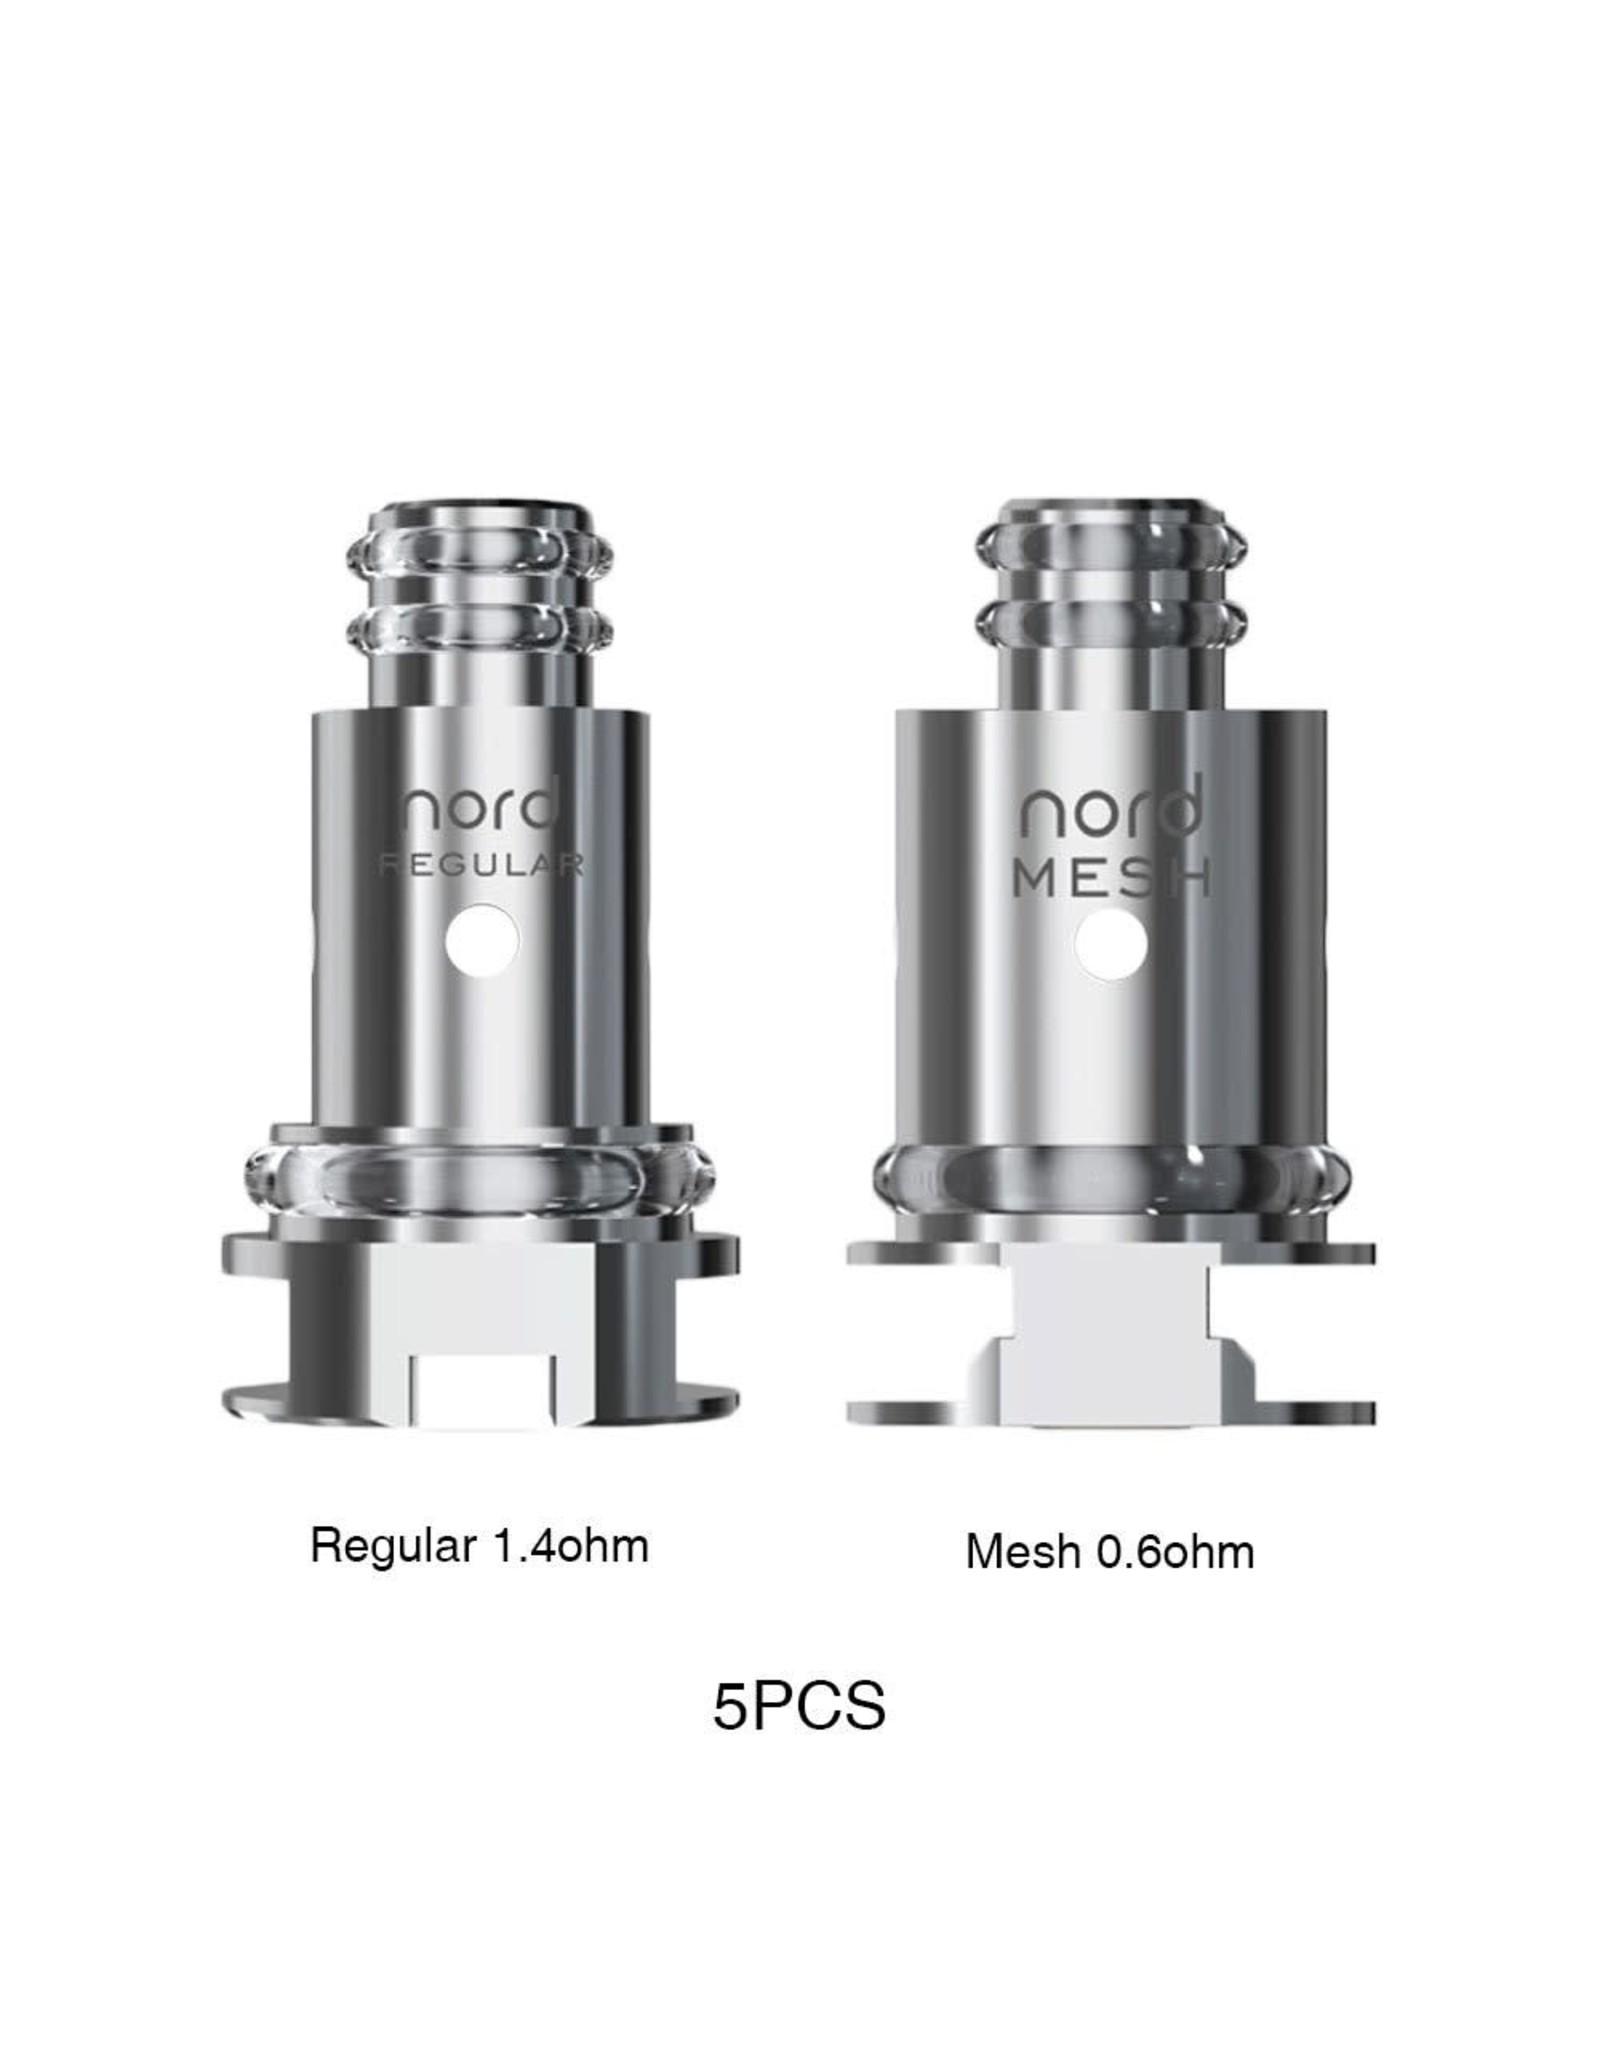 Smok Smok Nord Replacement Coils (5/Pk)